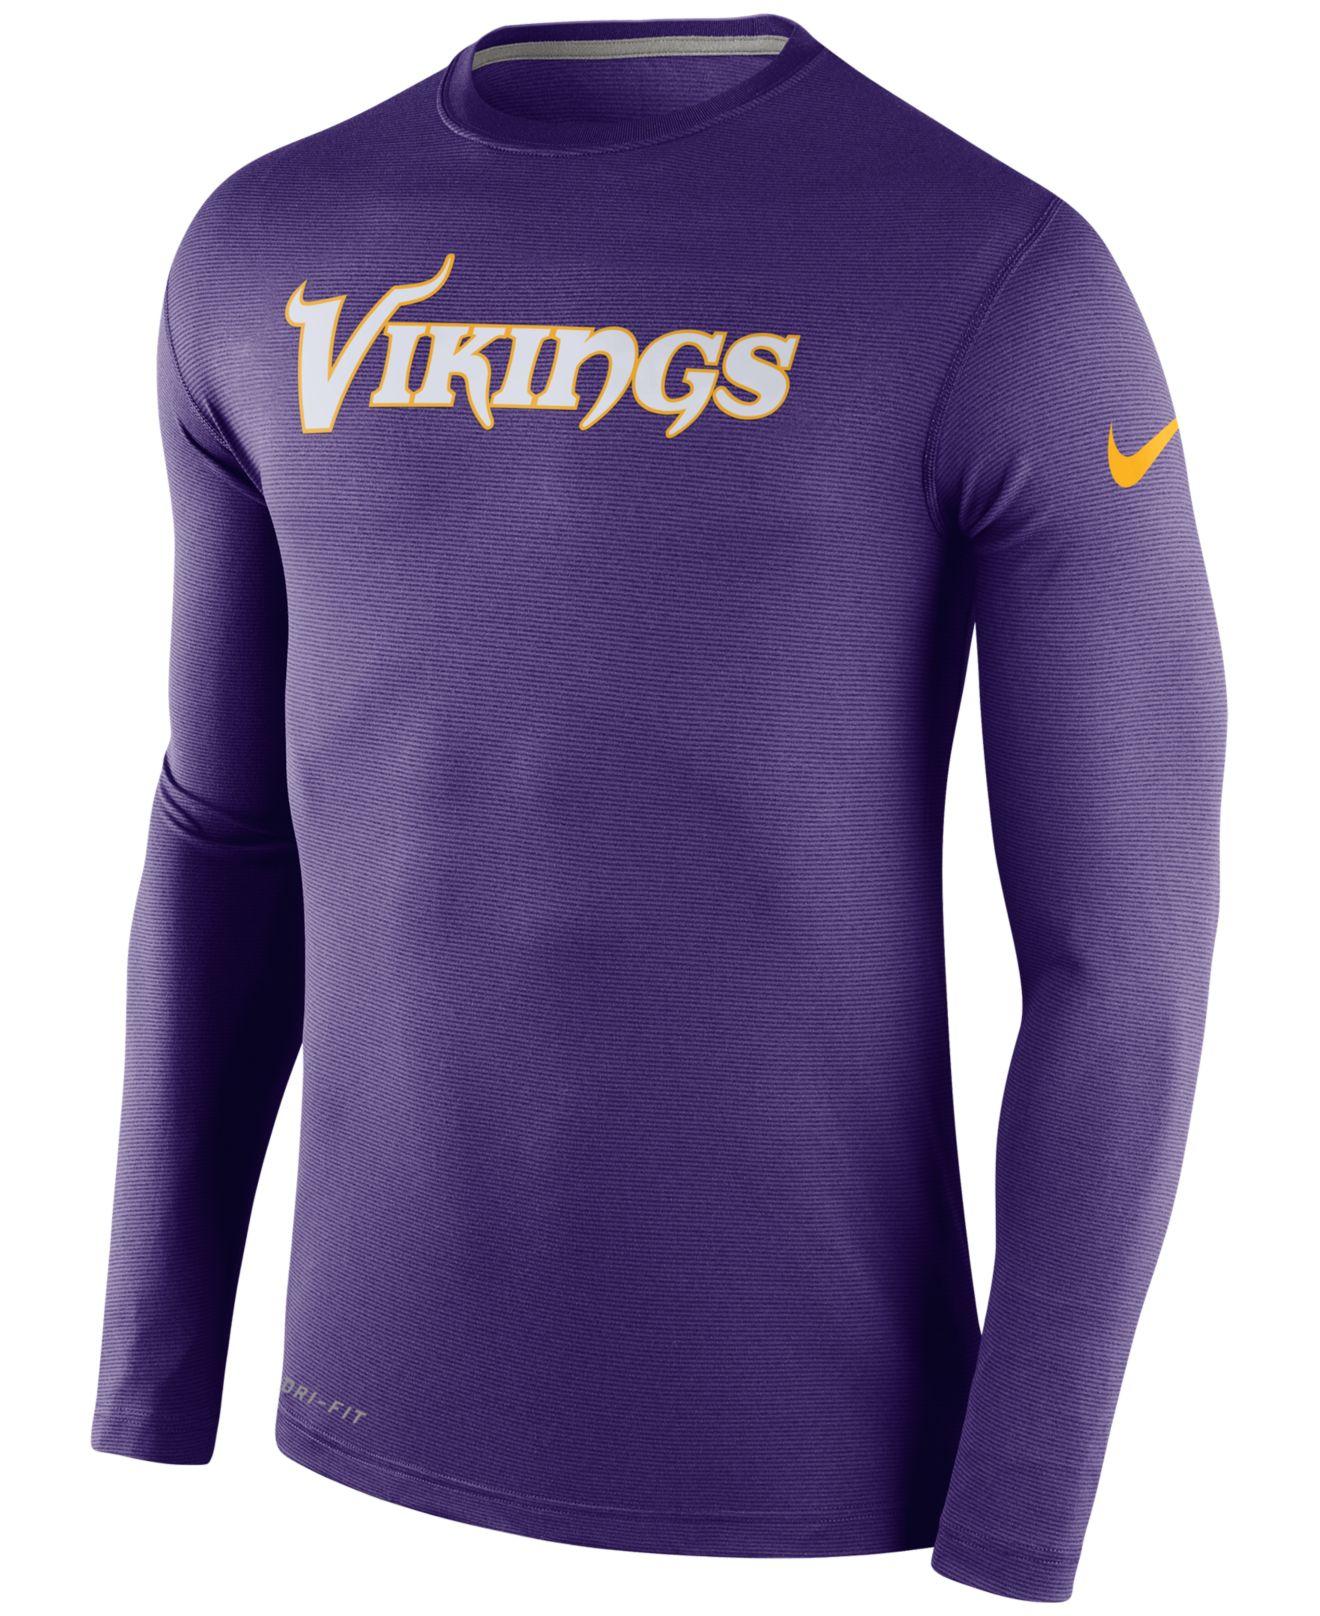 Nike Men's Long-sleeve Minnesota Vikings Dri-fit Touch T-shirt in ...